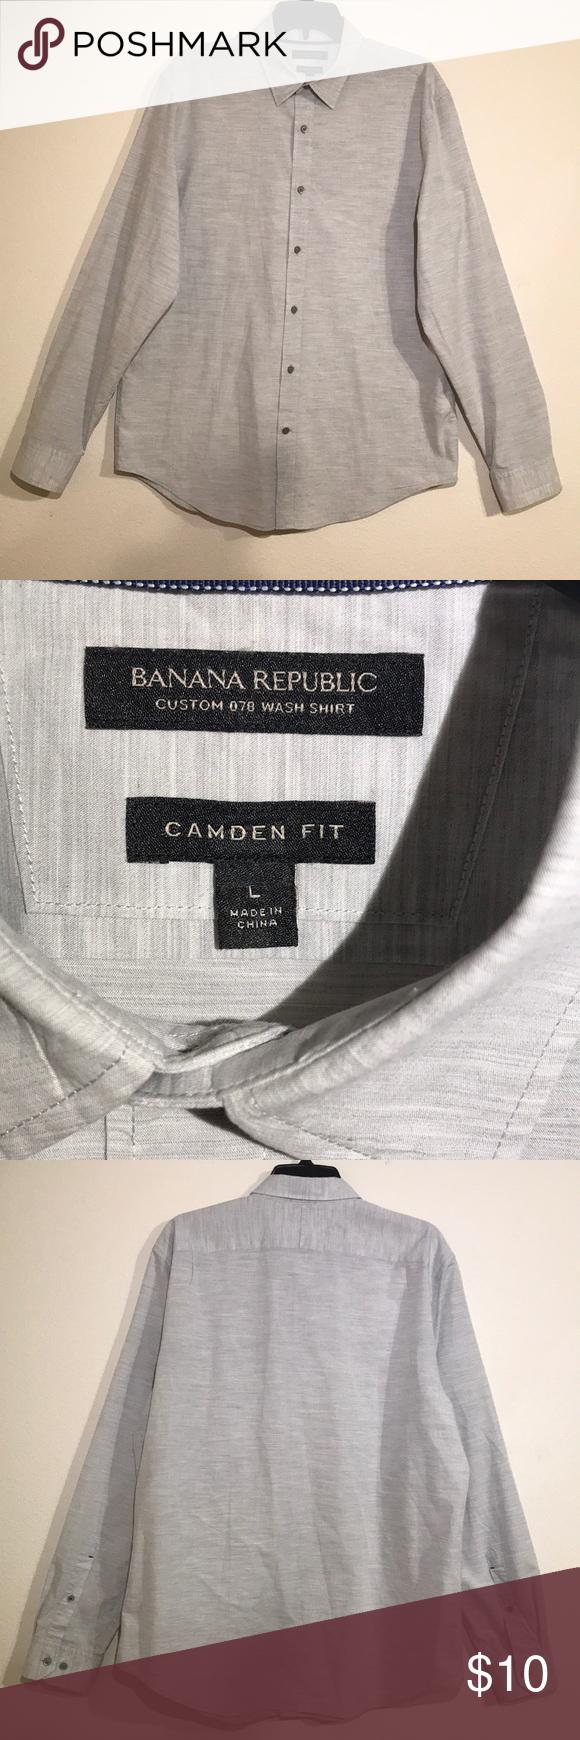 a483adda47d Banana Republic Camden Fit Custom Wash Shirt Button down shirt. Light grey.  Great condition. Banana Republic Tops Button Down Shirts